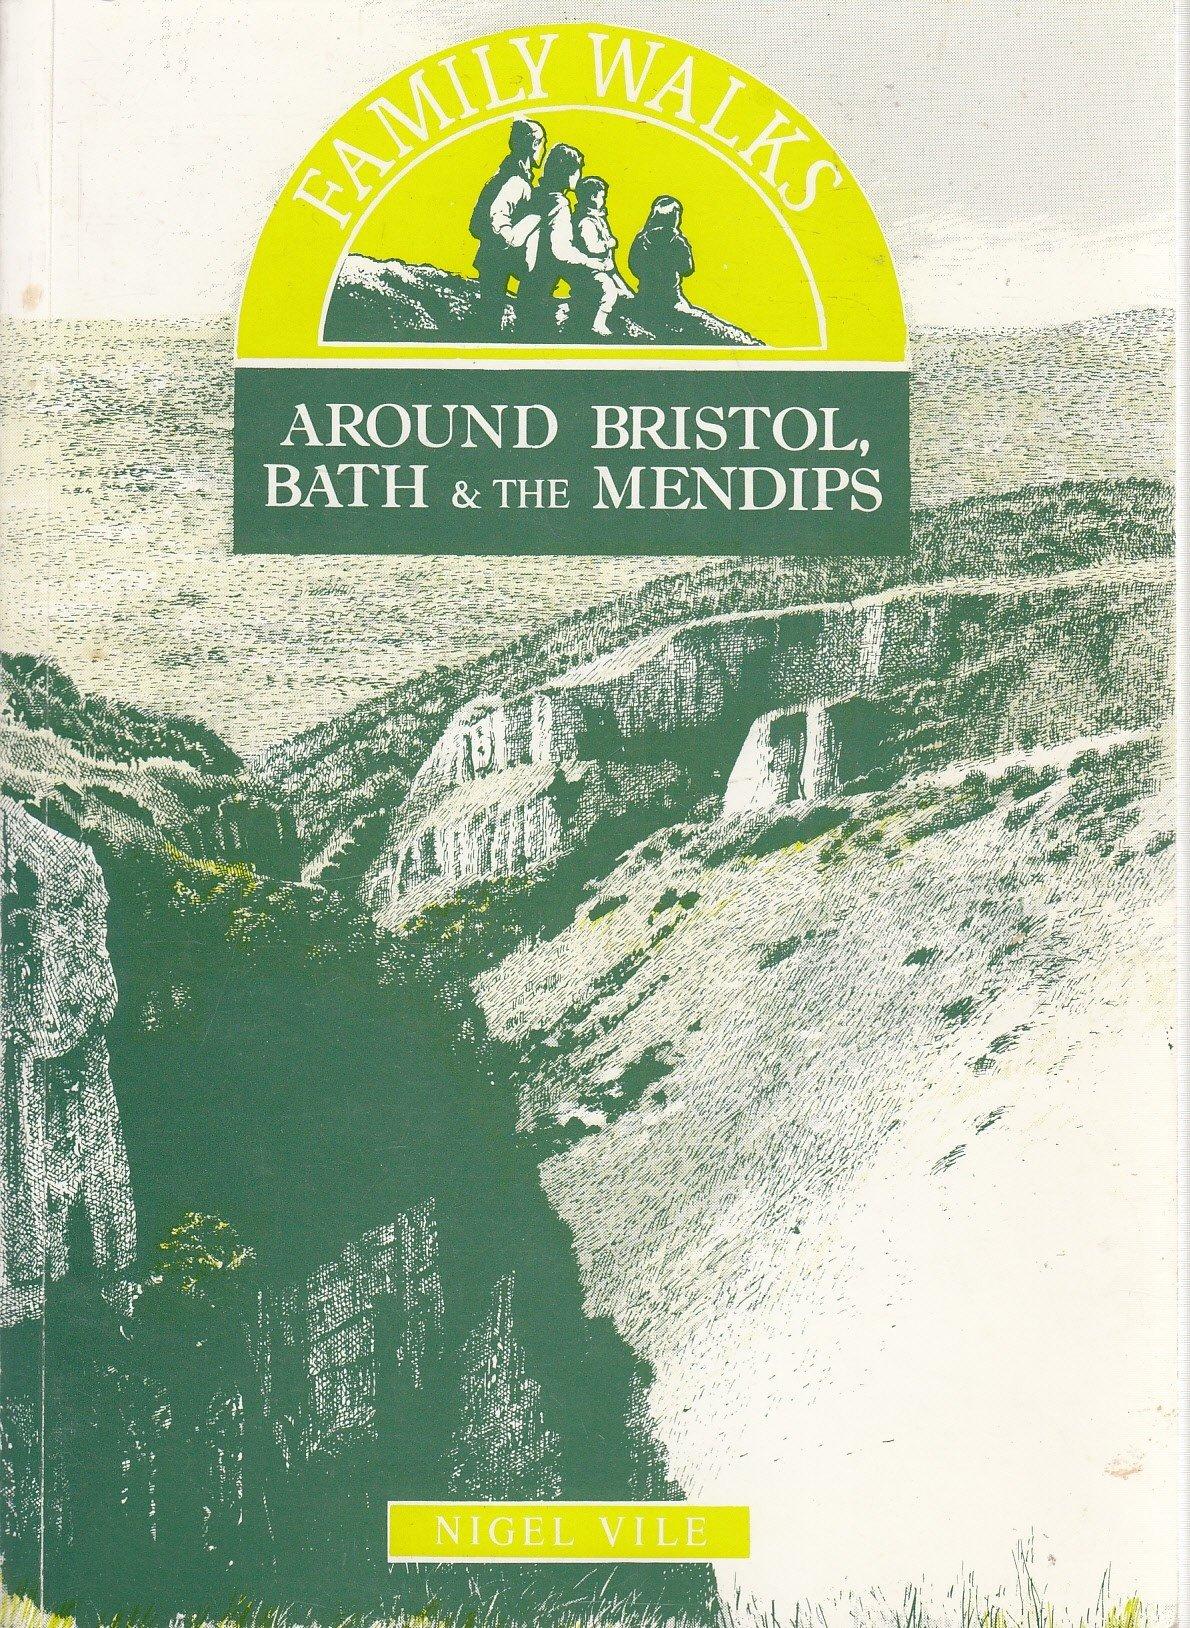 walkers map bristol bath the mendips